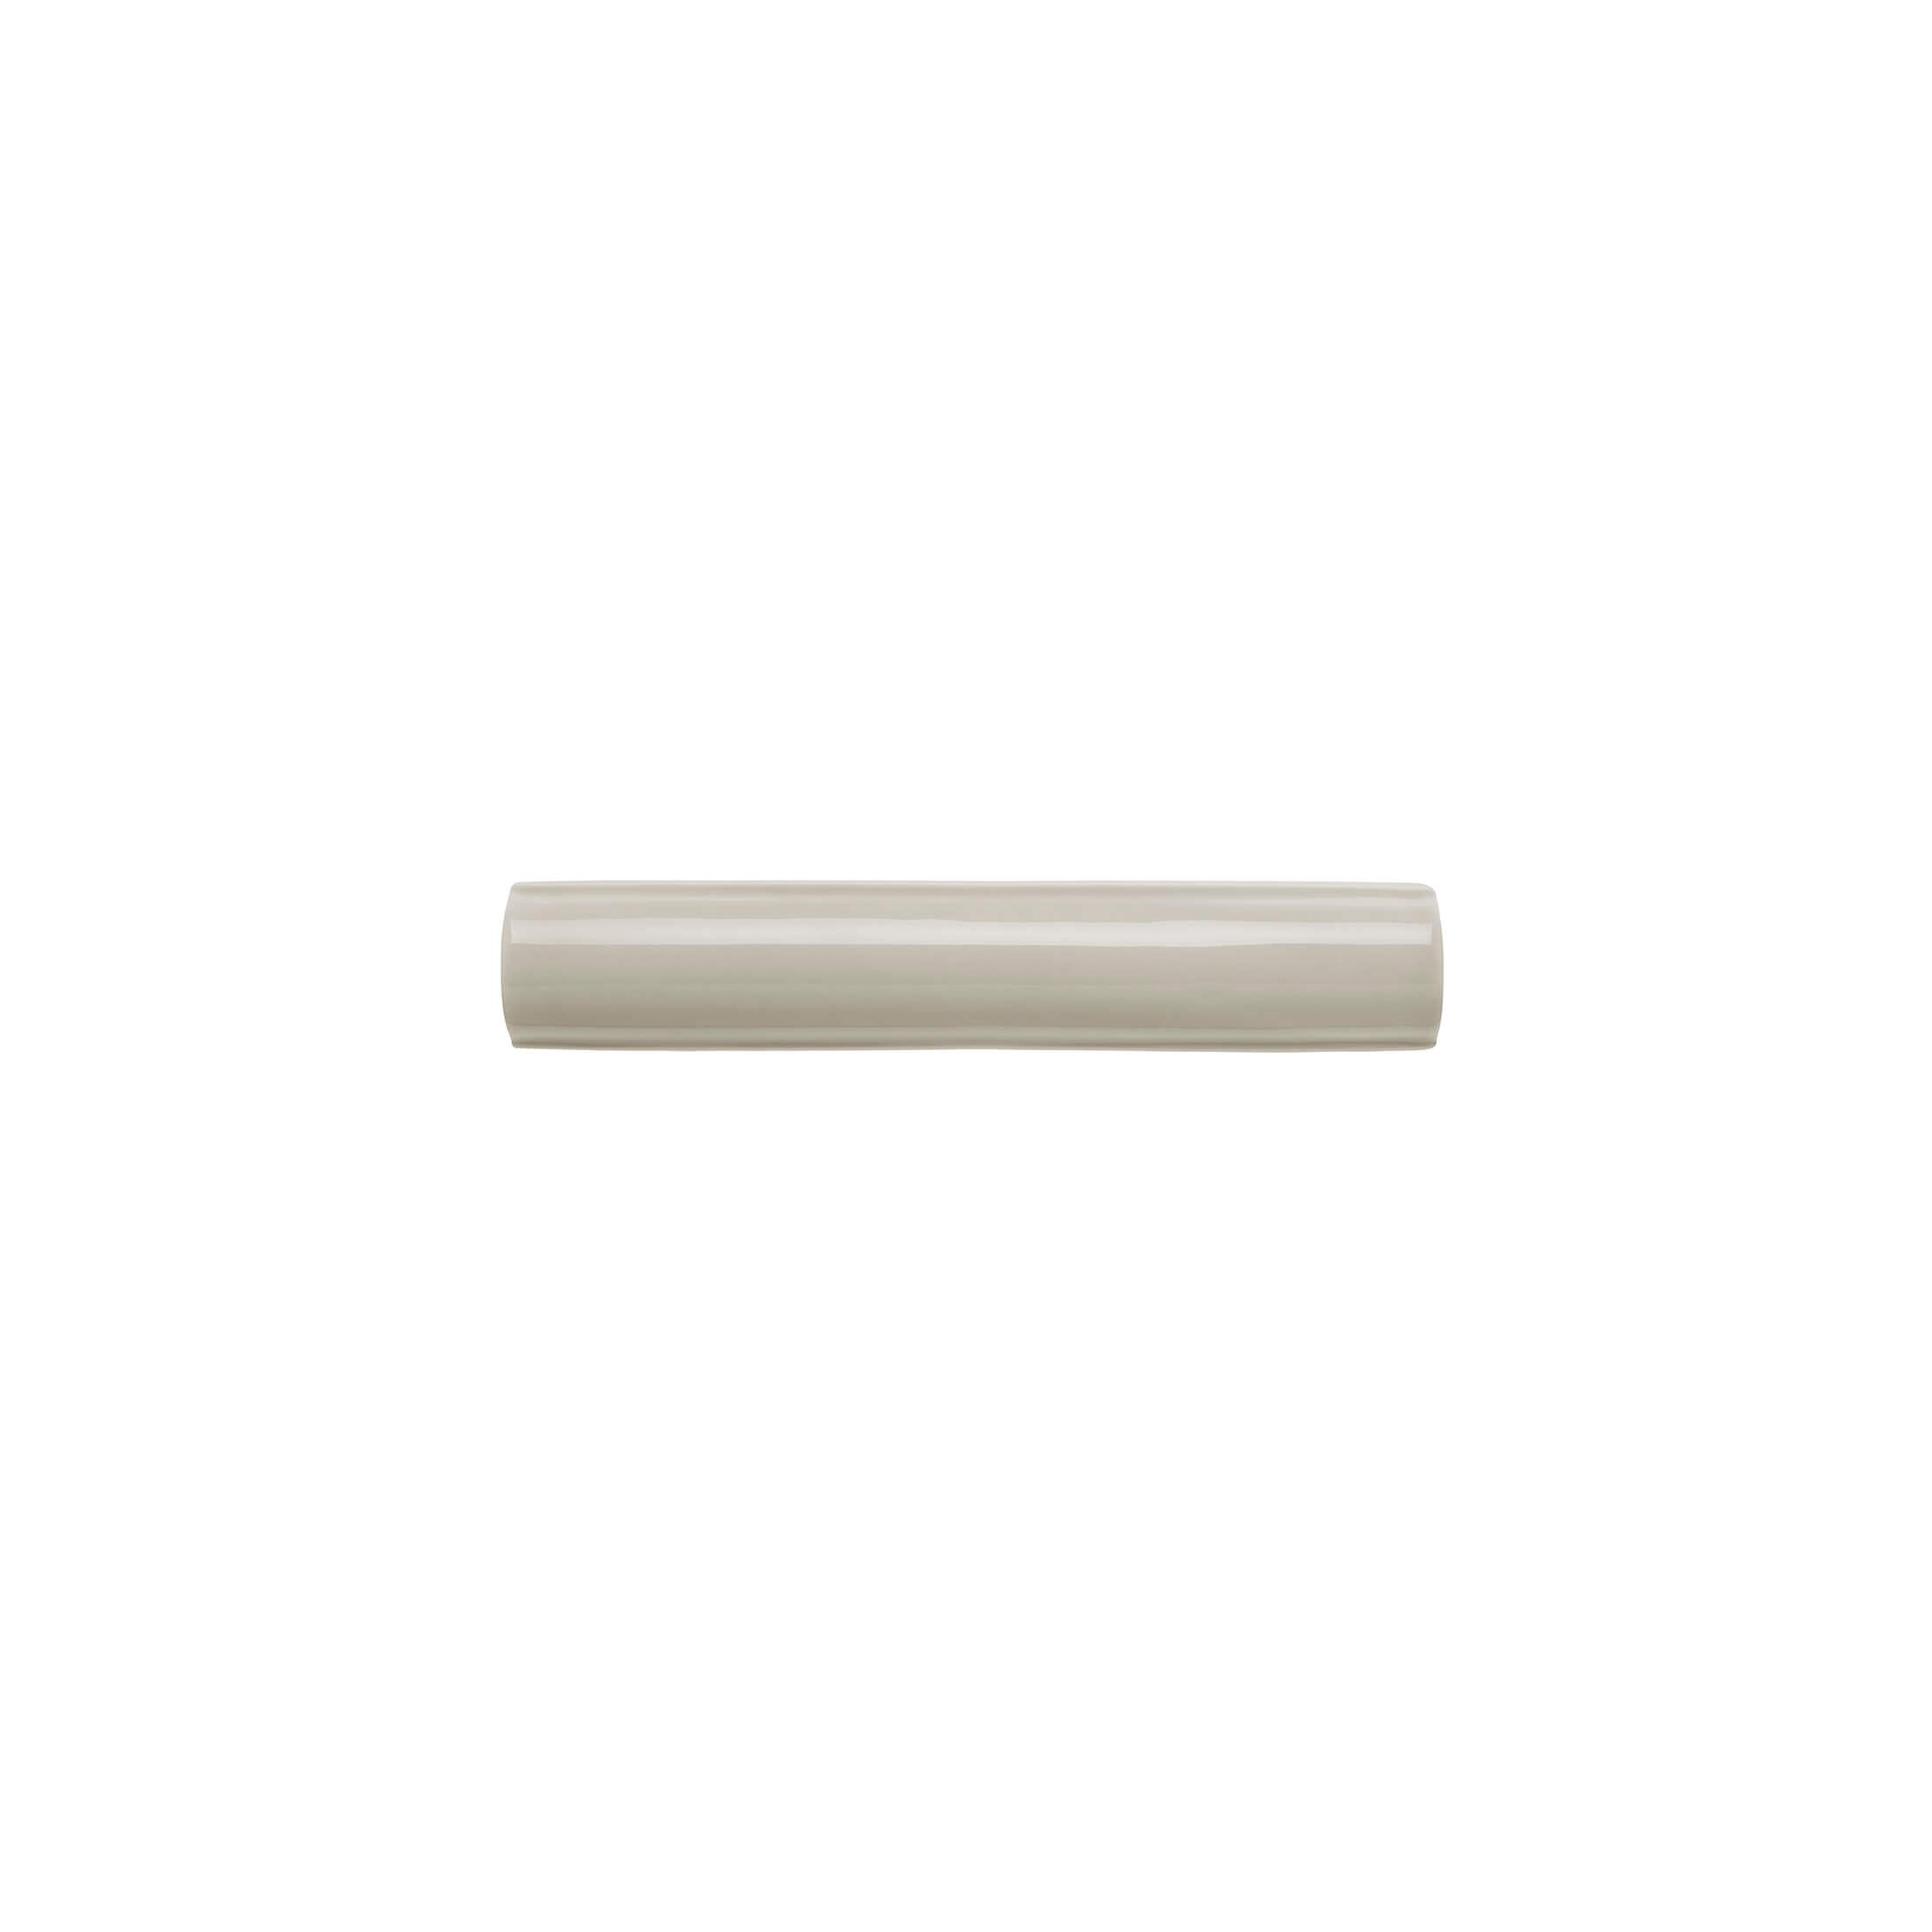 ADNE5493 - BARRA LISA - 2.5 cm X 15 cm